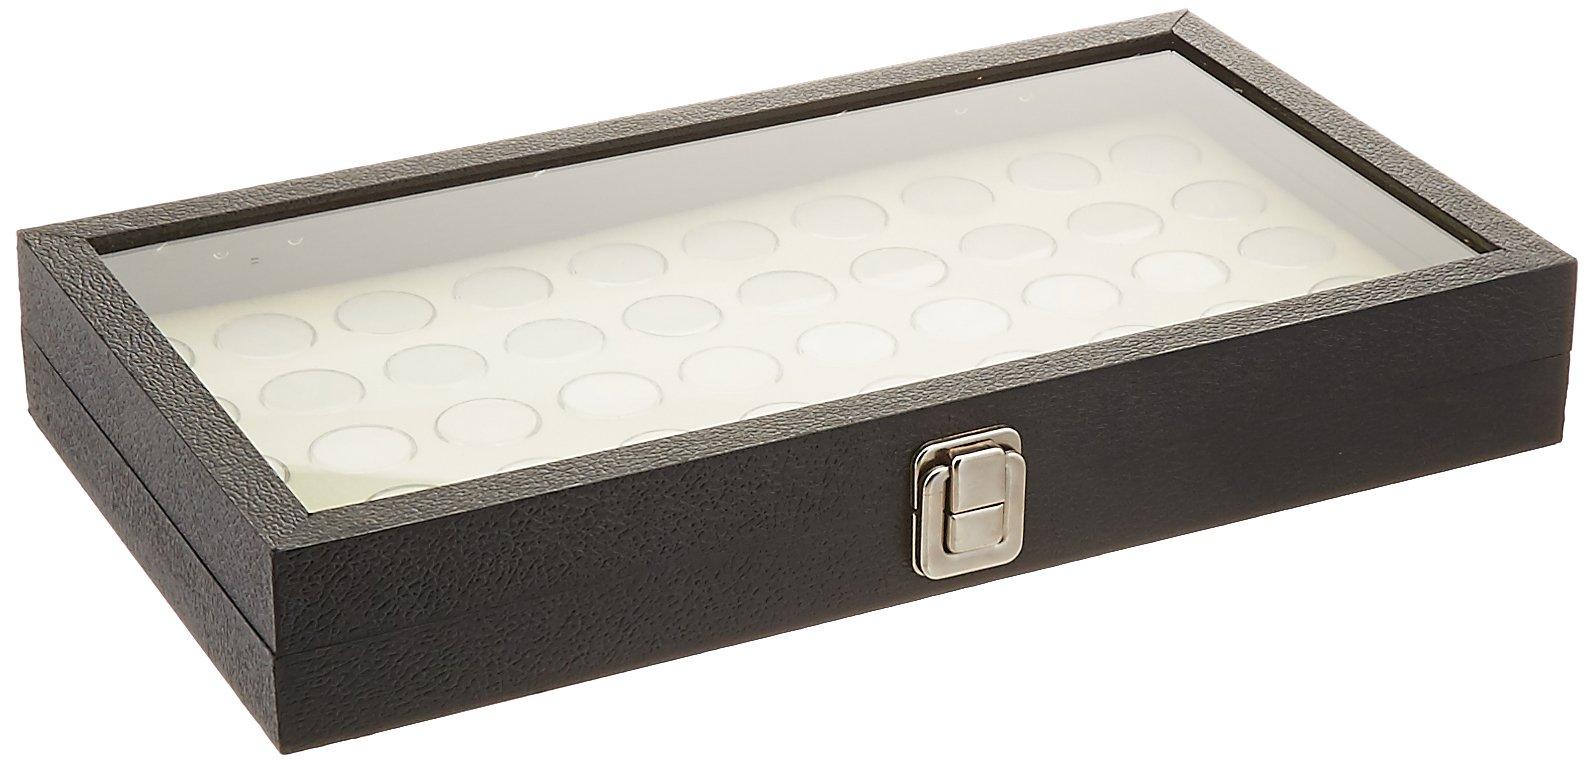 New Glass Top Jewelry Display Case Box with White 50 Gemstone Jars